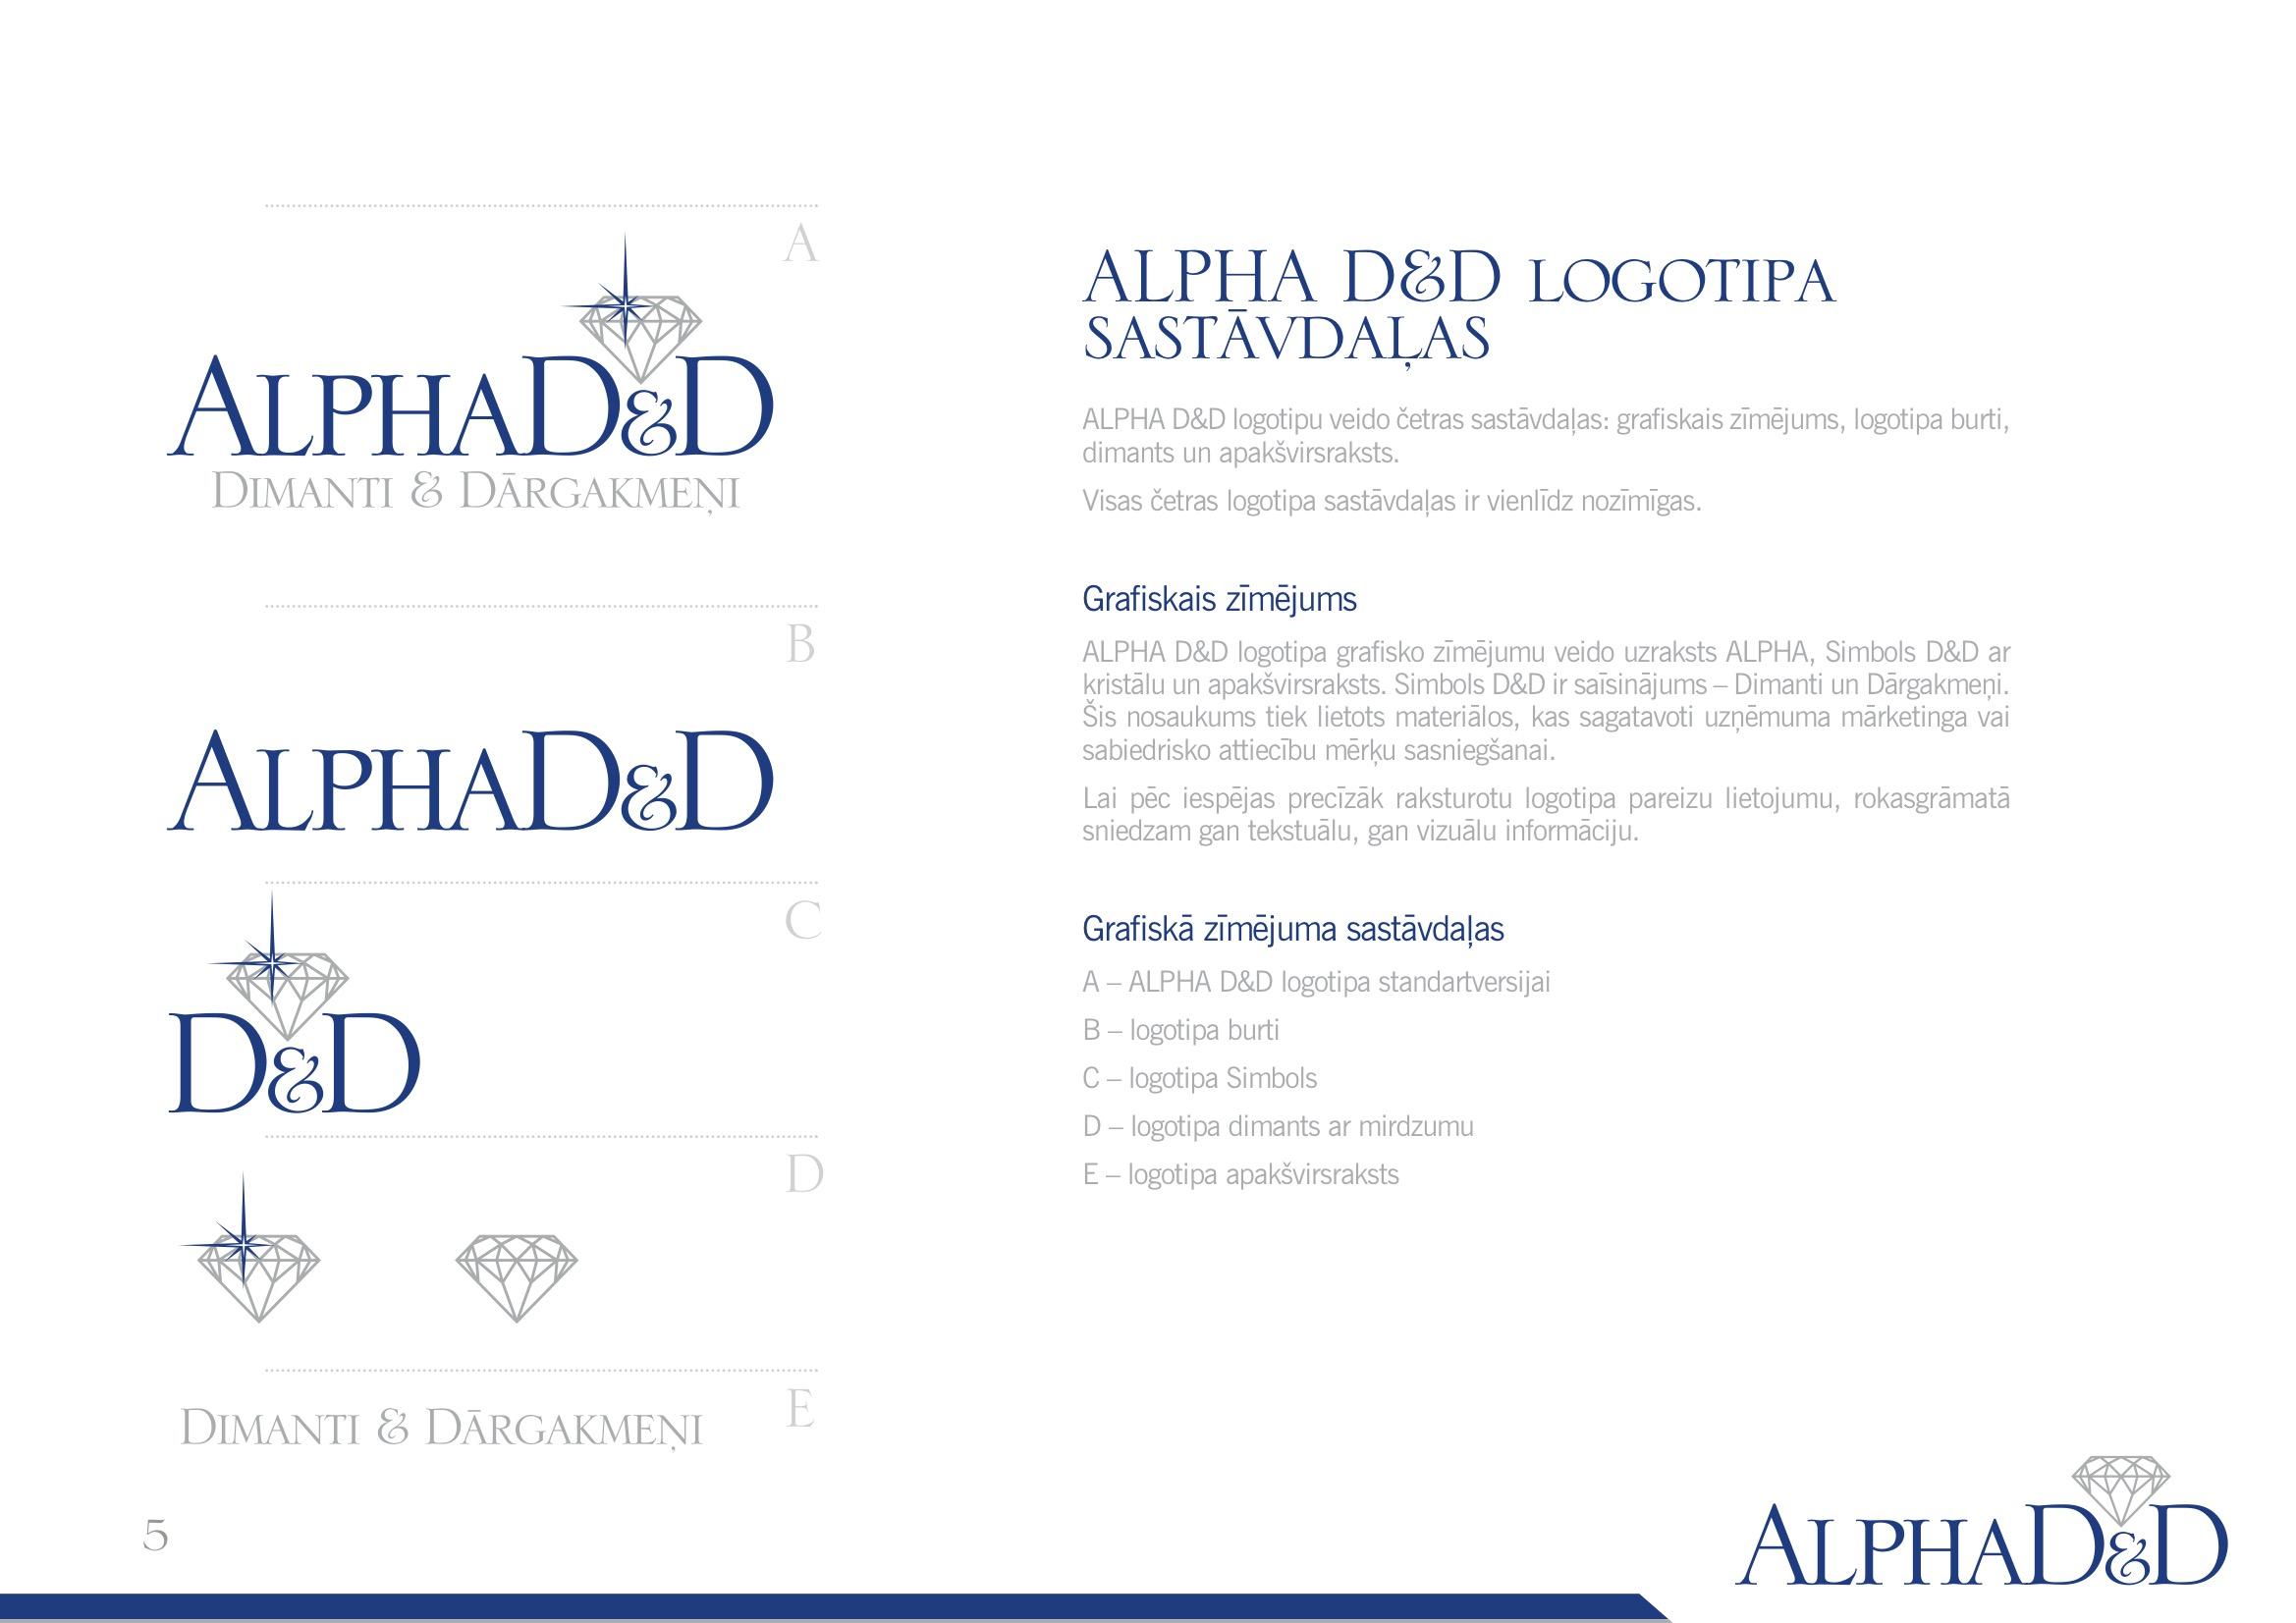 AlphaDD_Stils 5